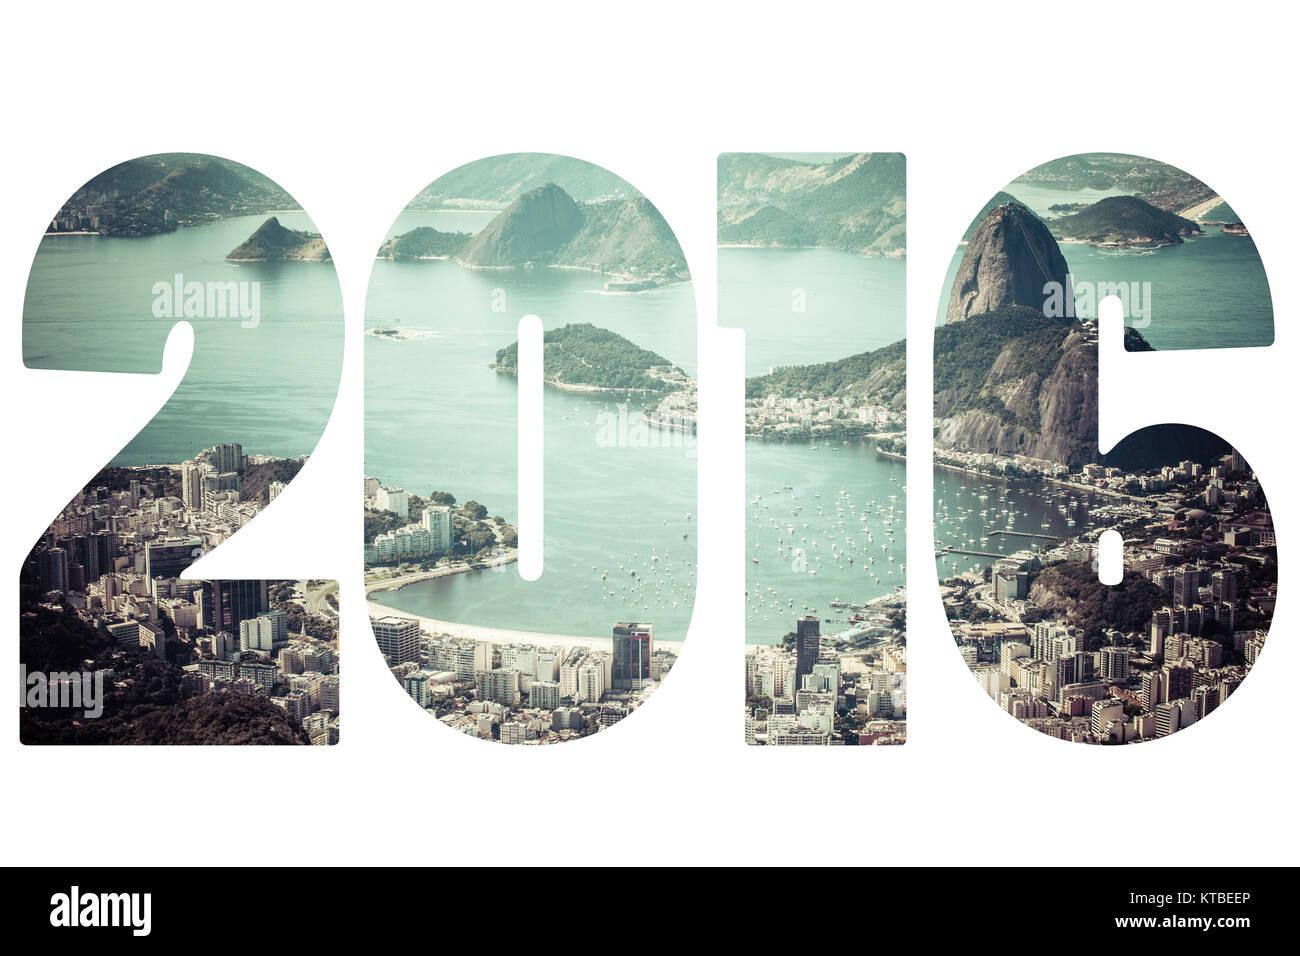 Word 2016 Rio de Janeiro, Brazil - Stock Image